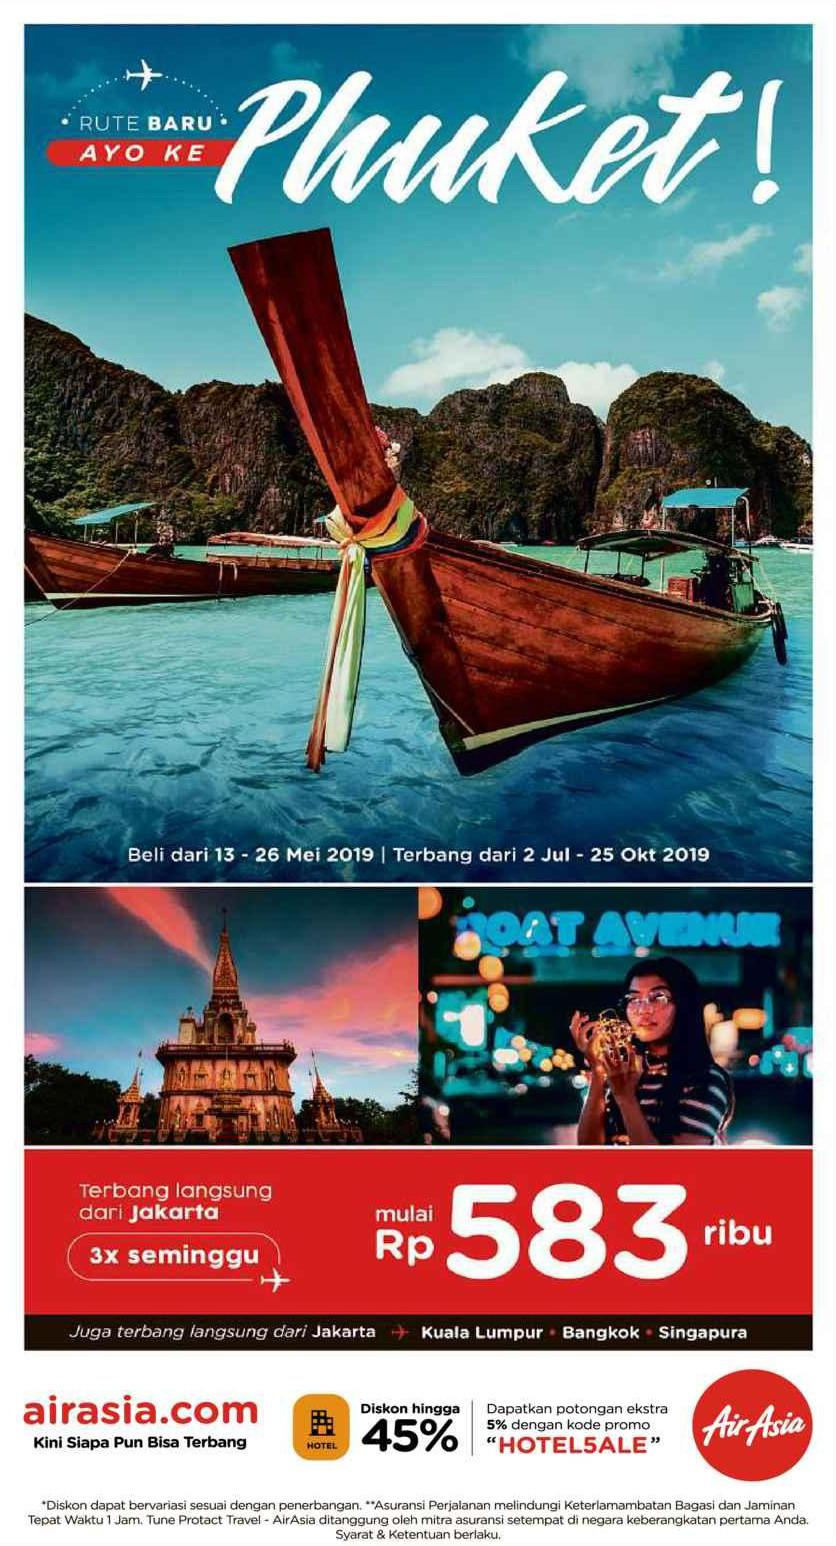 AirAsia Promo Terbang Langsung dari Jakarta – Phuket mulai Rp. 583.000